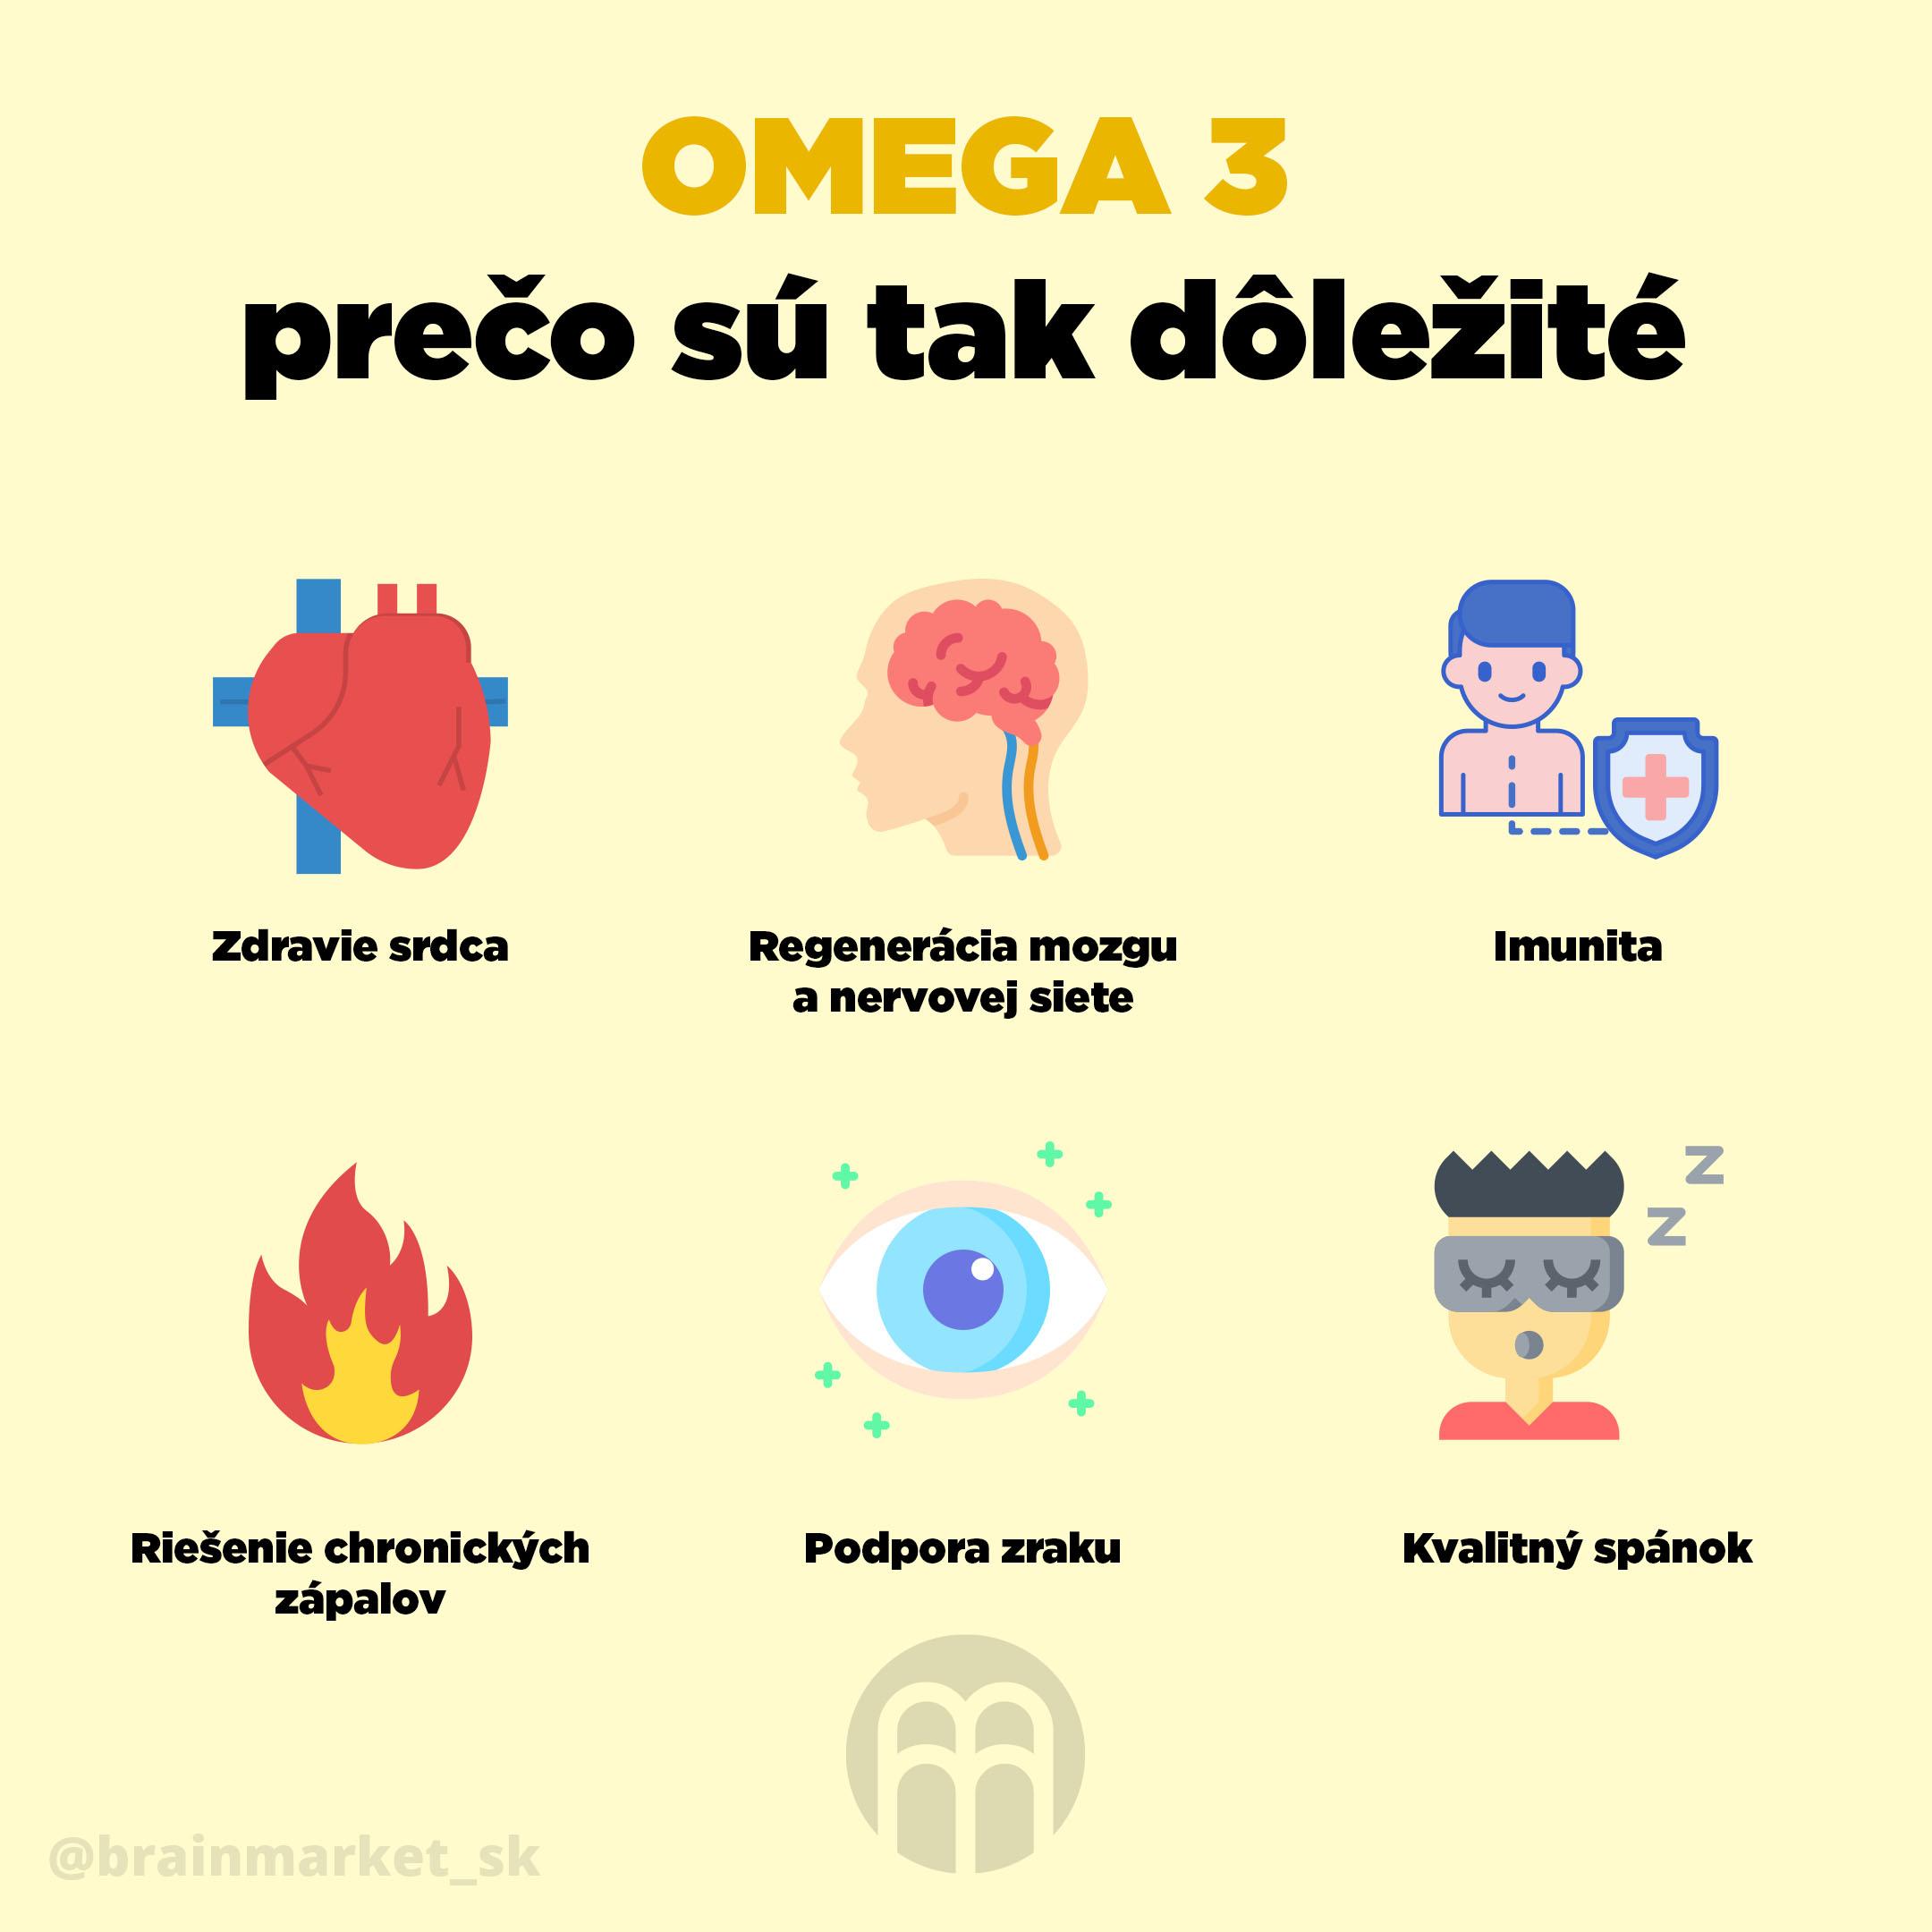 omega_3_preco_su_tak_dolezite_infografika_brainmarket_SK